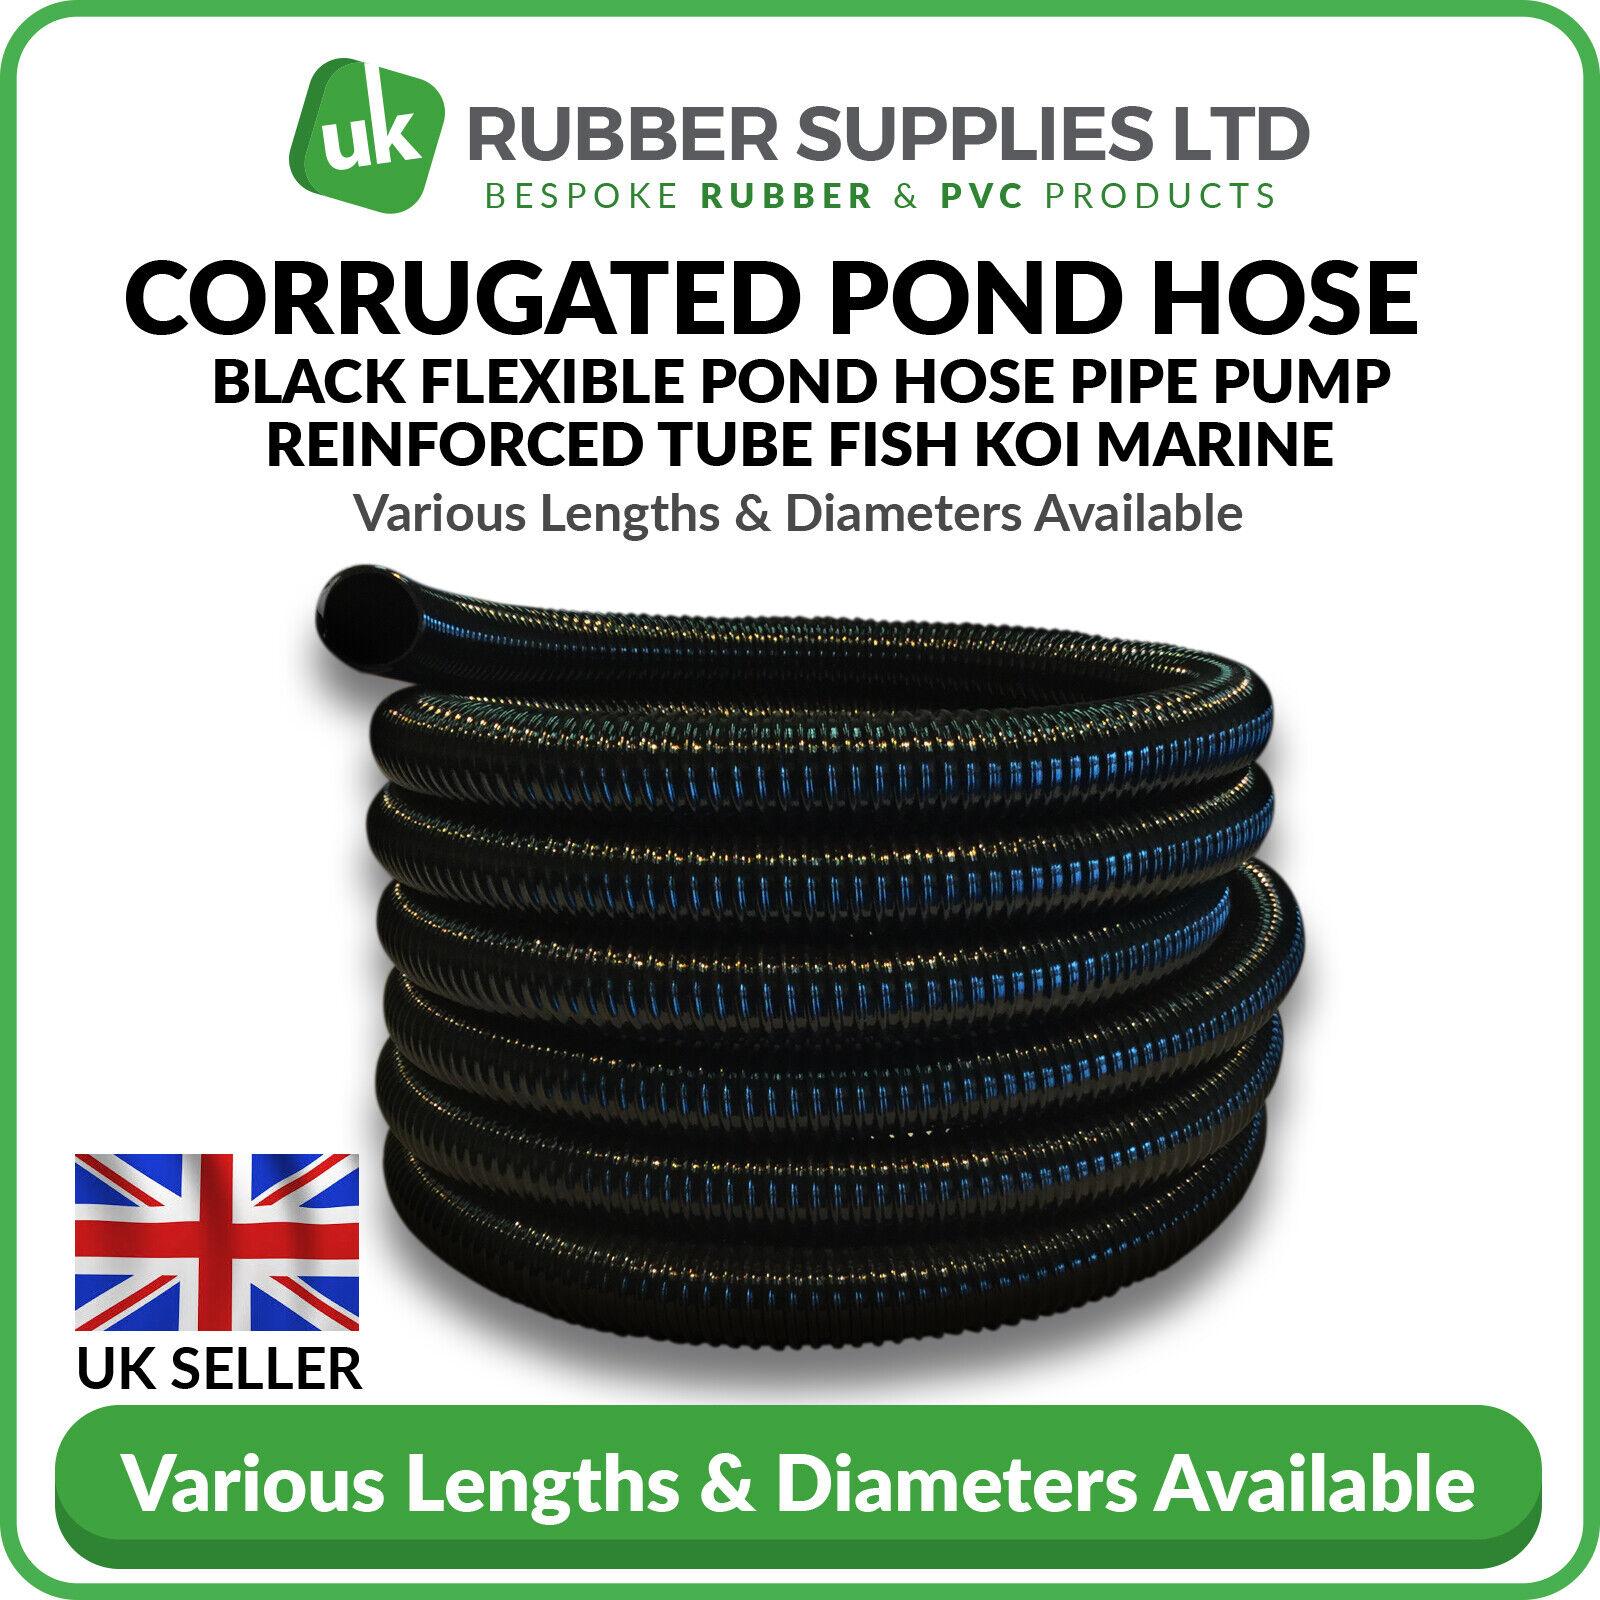 Black Corrugated Flexible Pond Hose Pipe Pump Reinforced Tube Fish Koi Marine